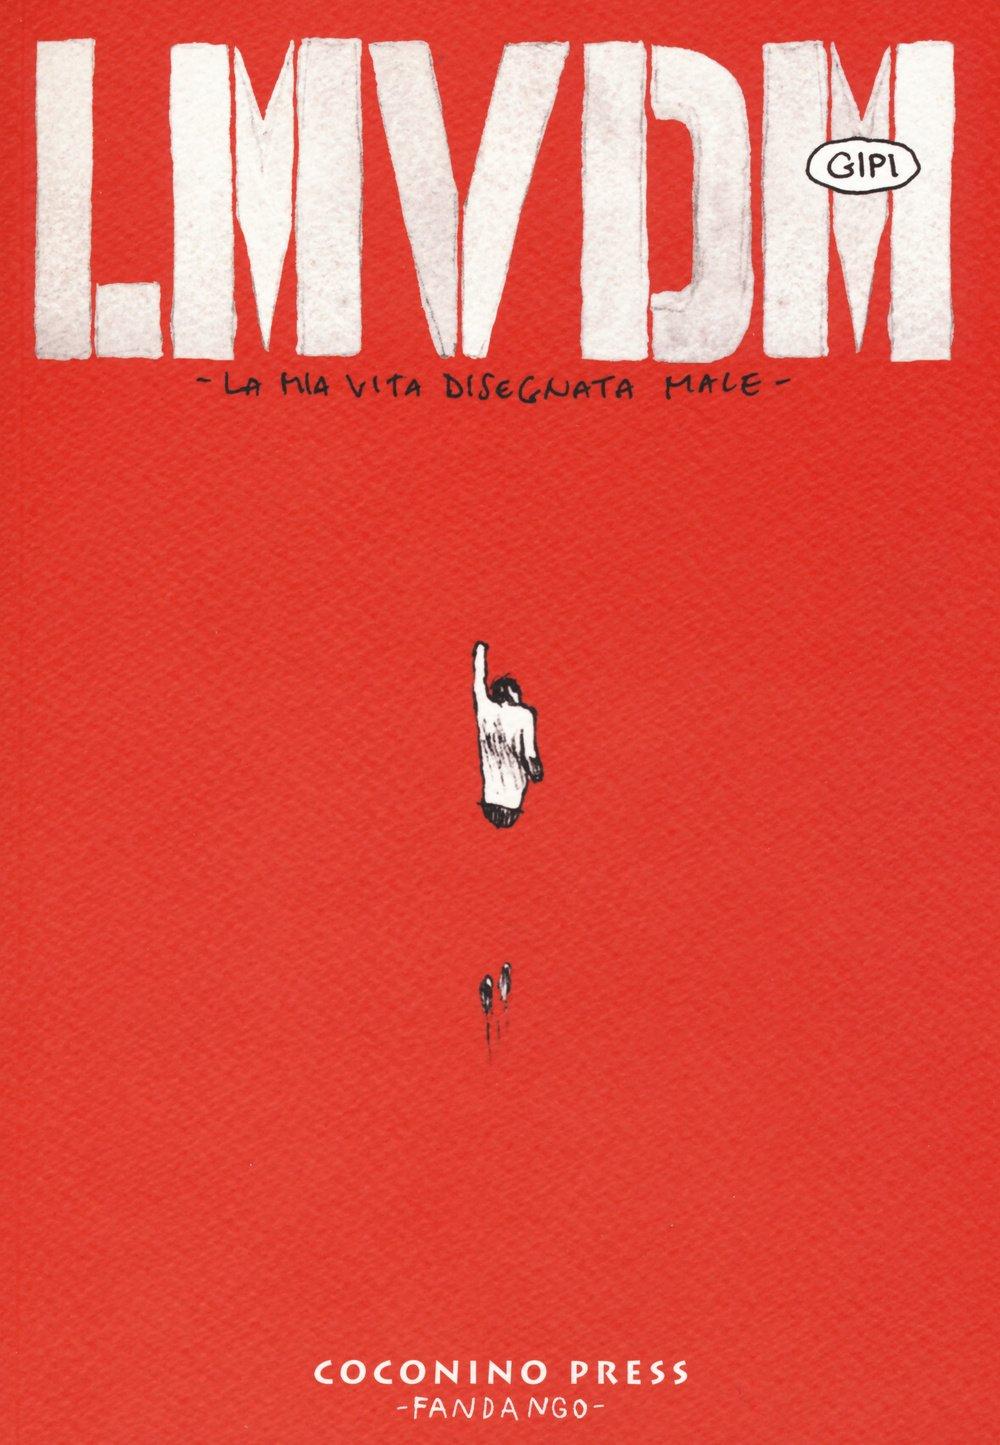 LMVDM. La mia vita disegnata male